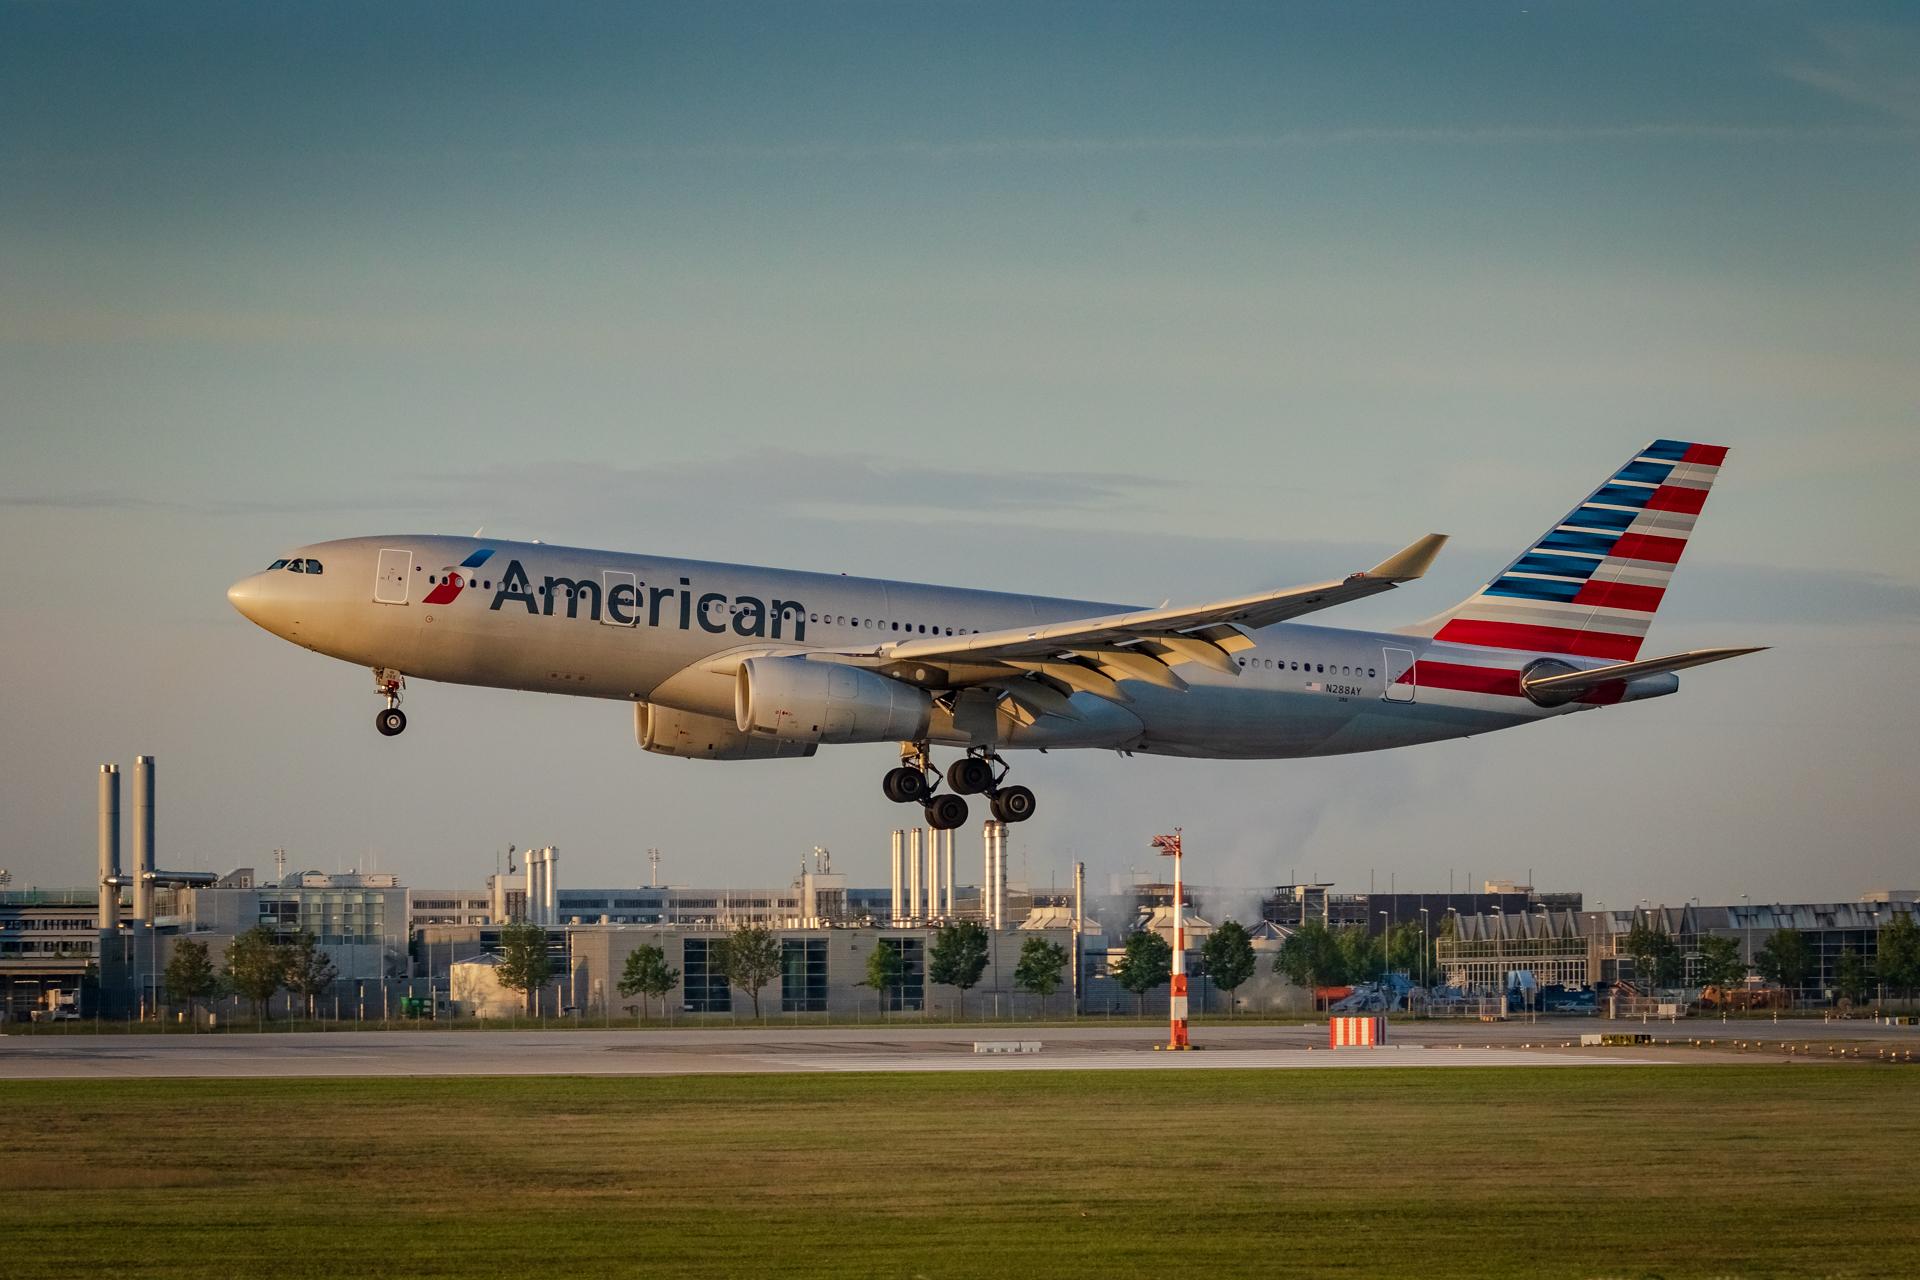 Airbus A330-200 der American Airlines. Foto: thekk.xyz